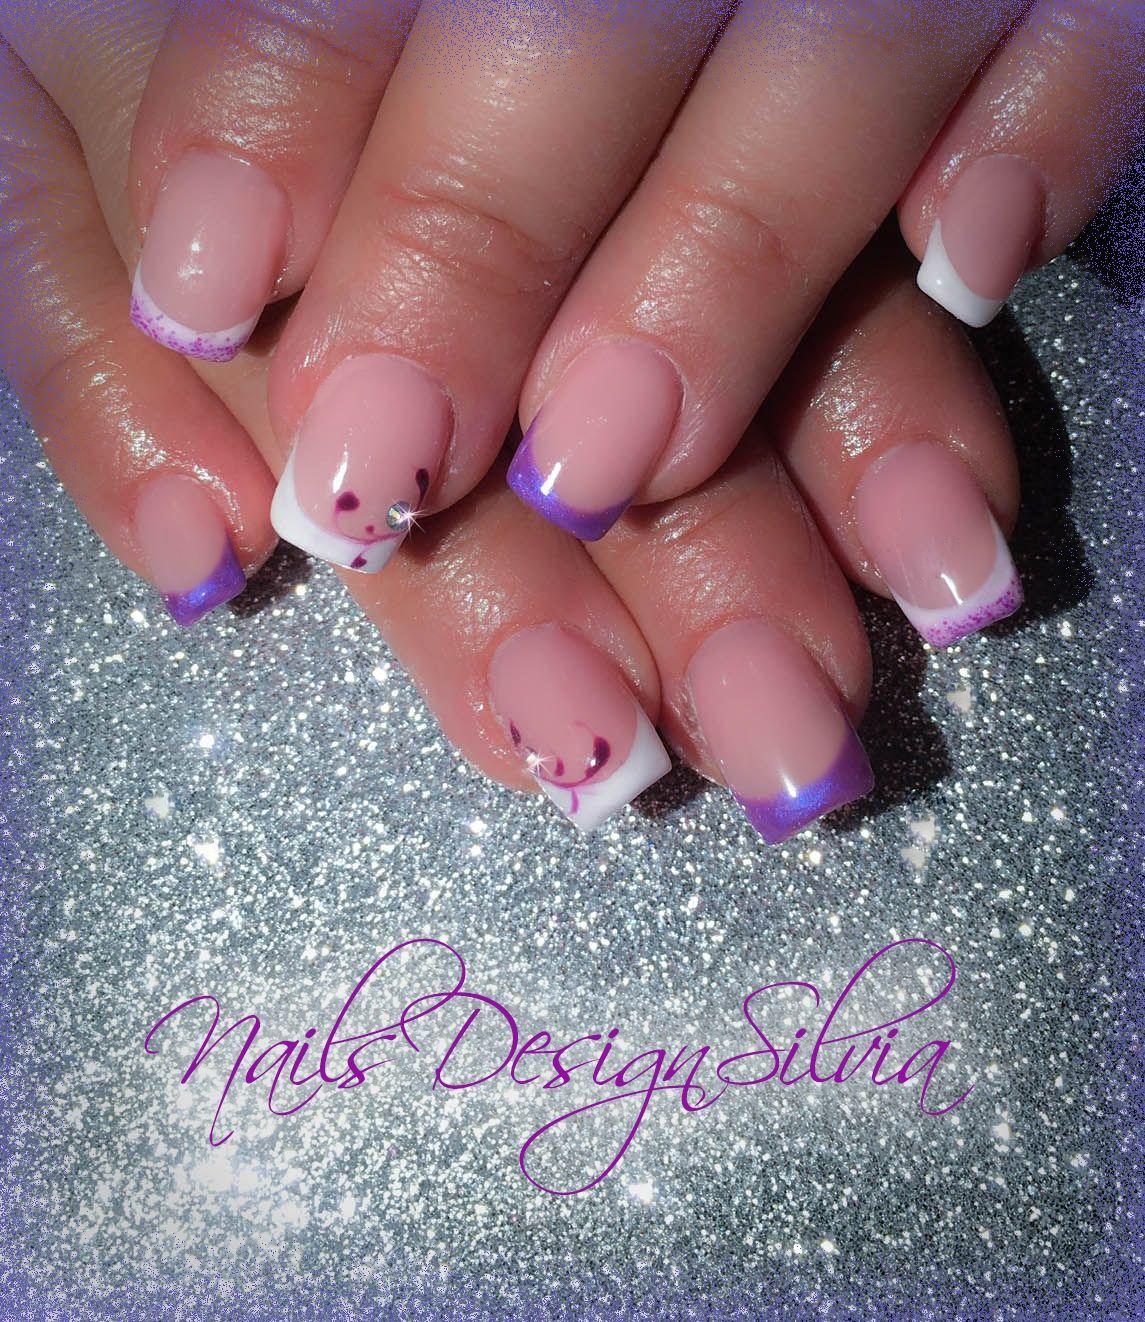 unghie french viola bianco (con immagini) | French unghie ...